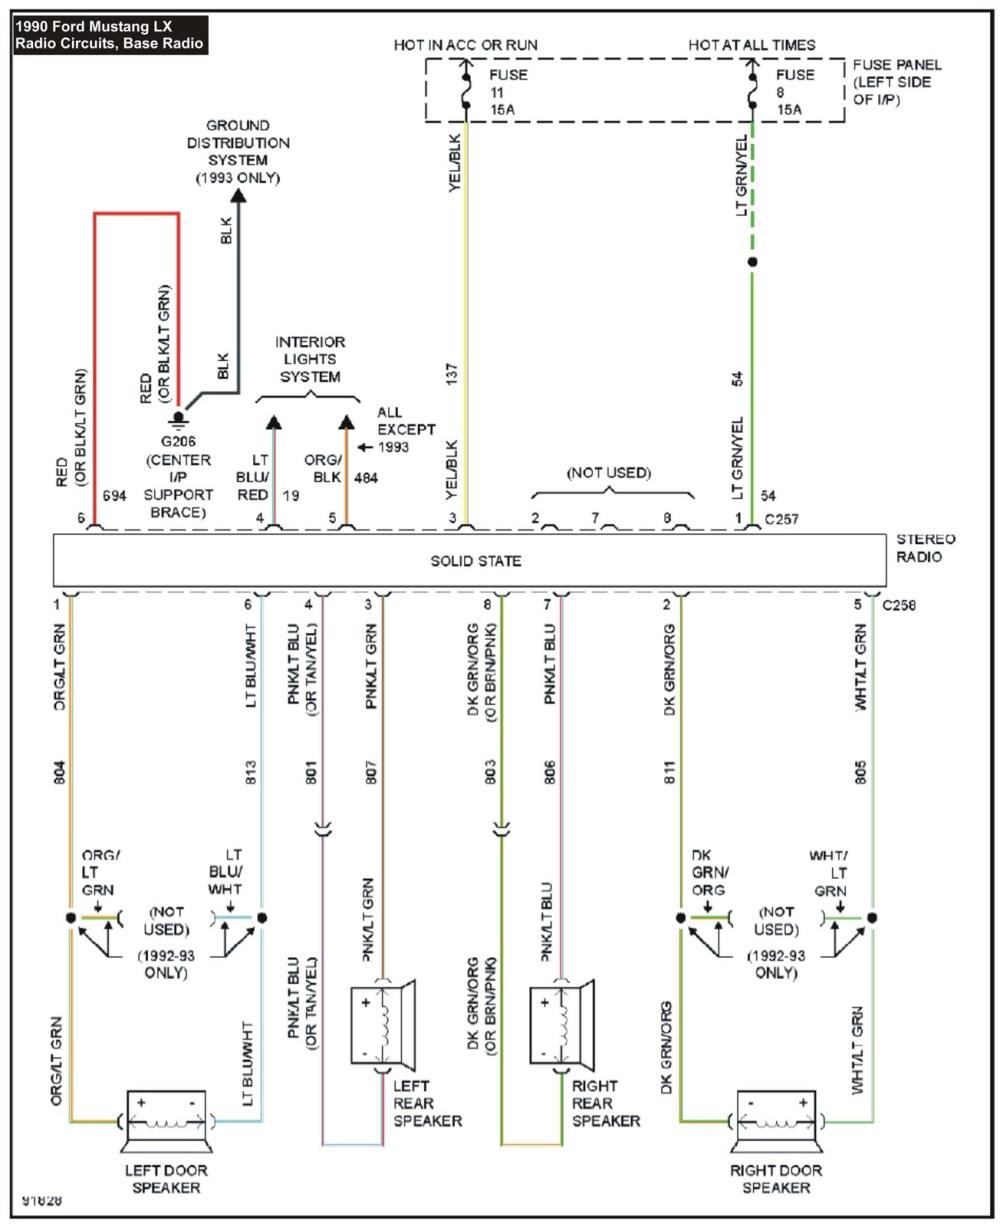 medium resolution of 1990 mustang radio wiring diagram download 2000 ford mustang stereo wiring diagram elegant kymco super